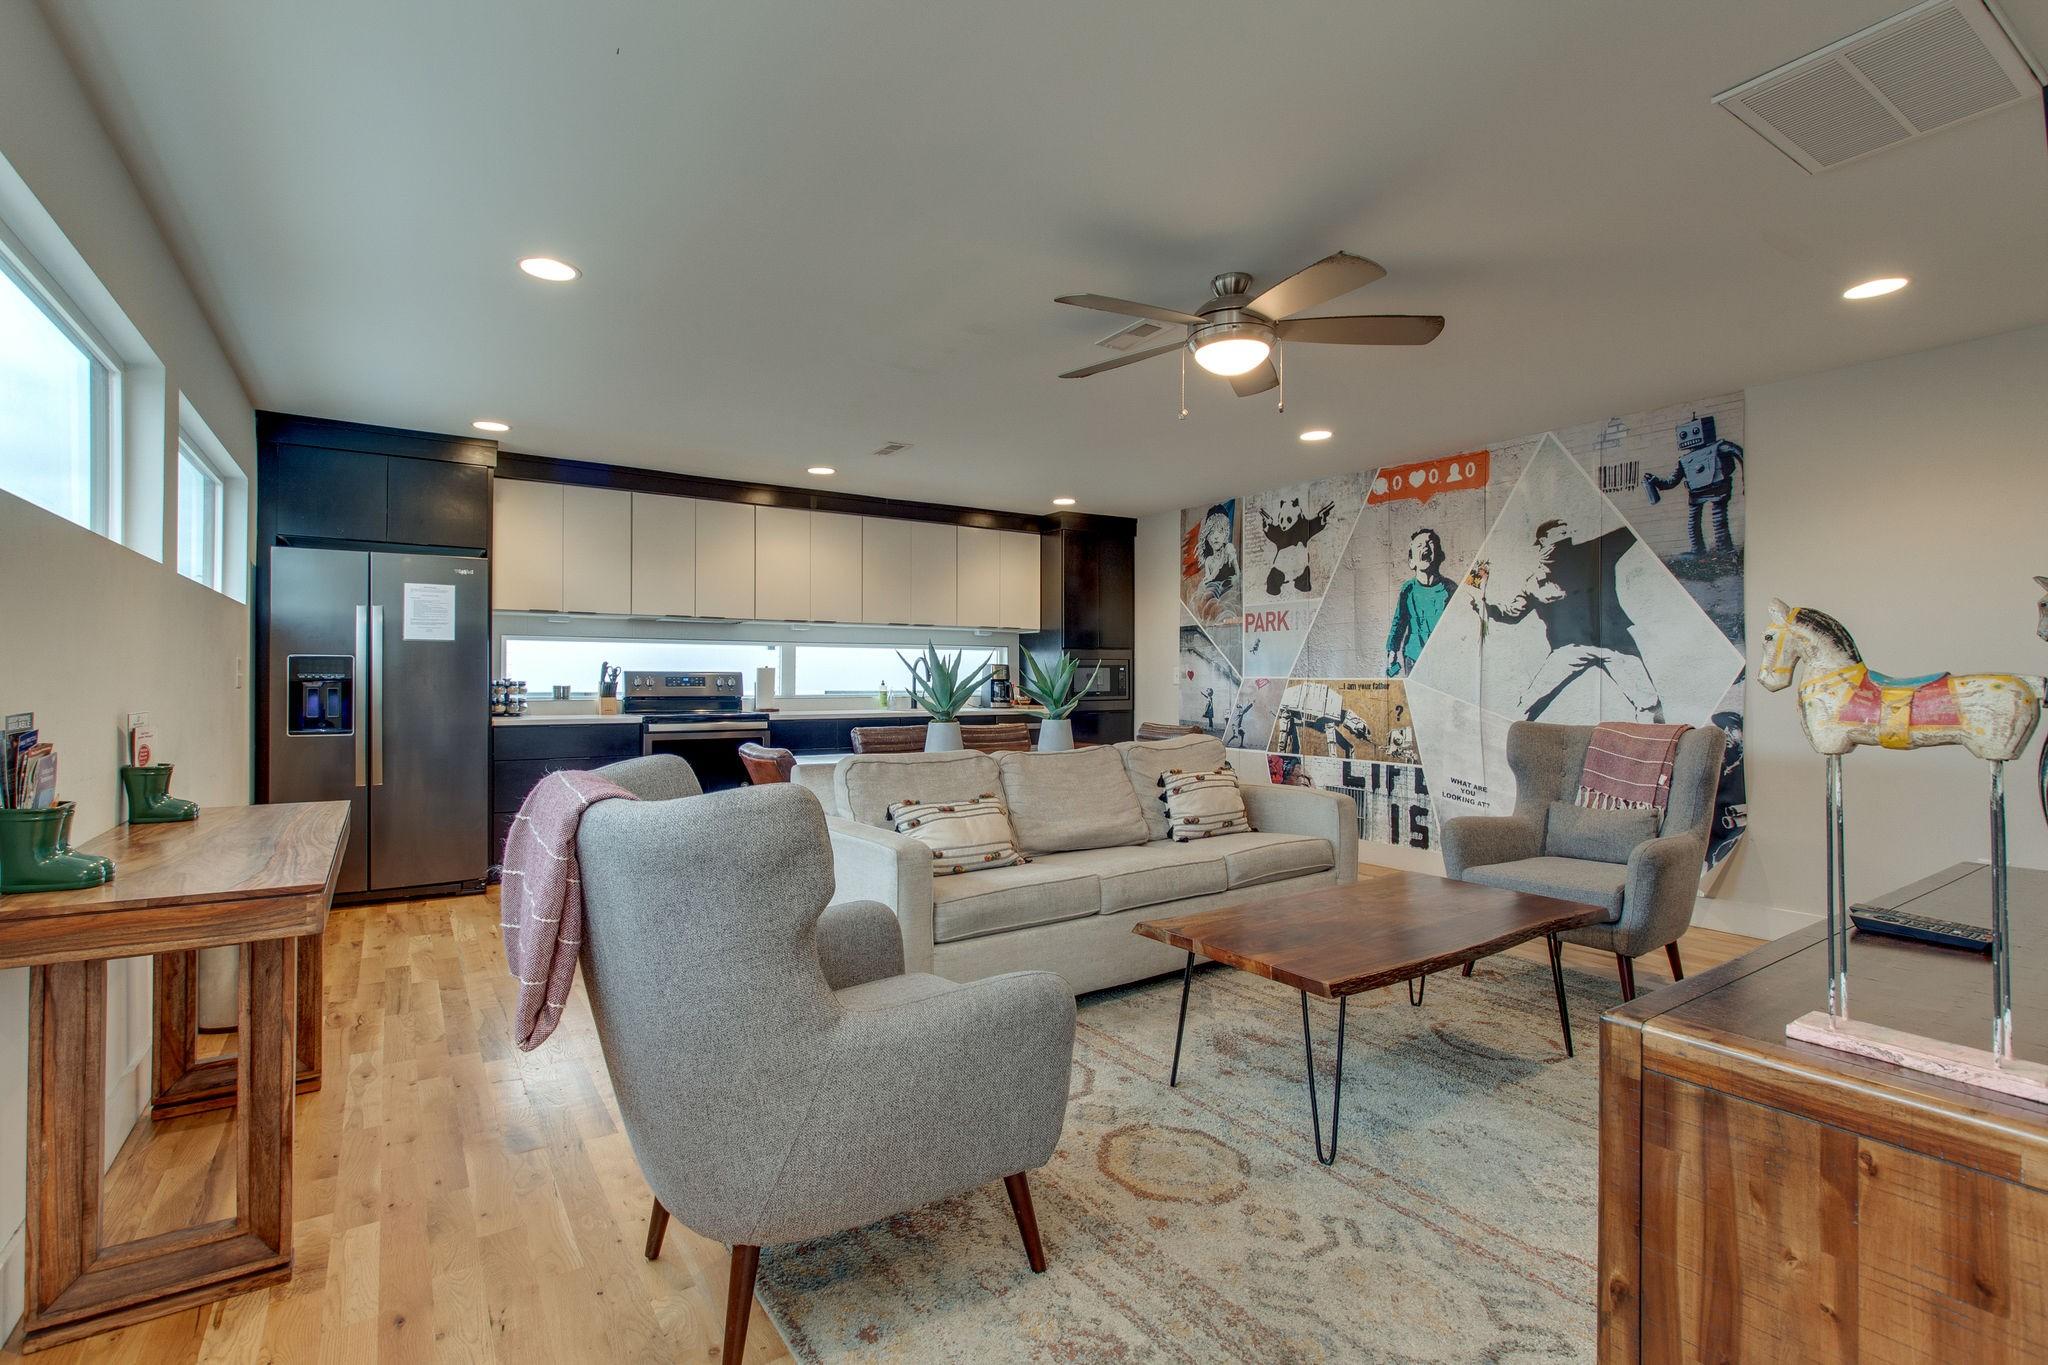 2A Fern Ave, Nashville, TN 37207 - Nashville, TN real estate listing